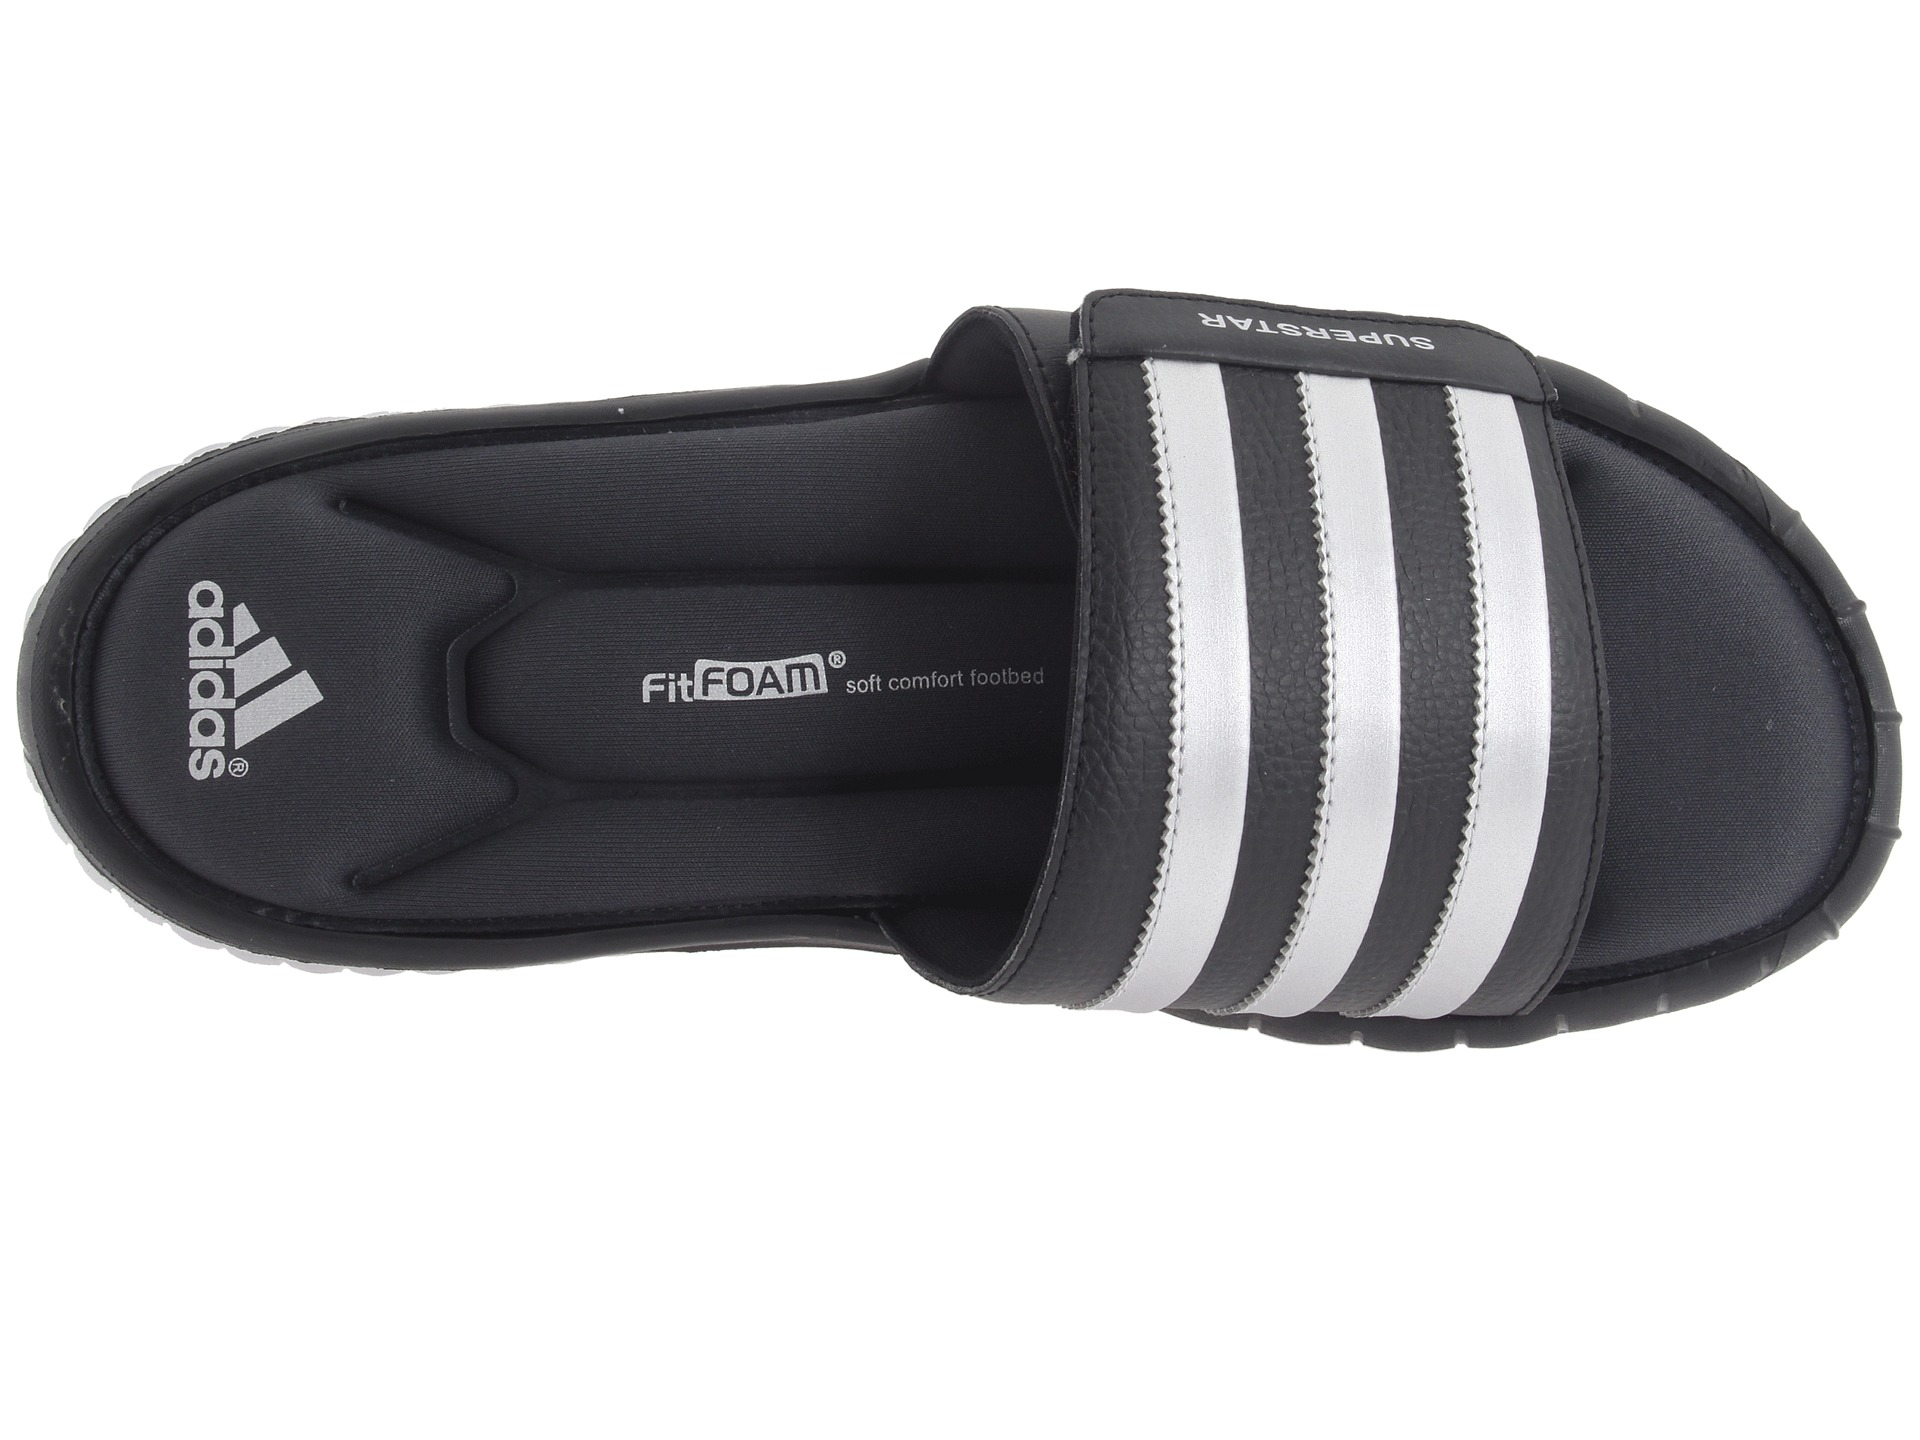 bd64a82714c7 Adidas Superstar 3g Slides strattondesignservices.co.uk